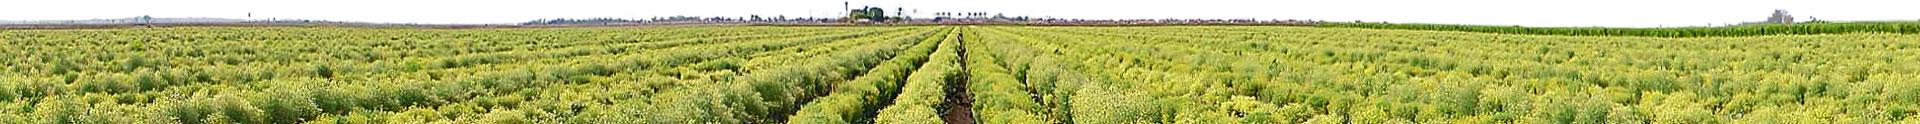 Broccoli Field